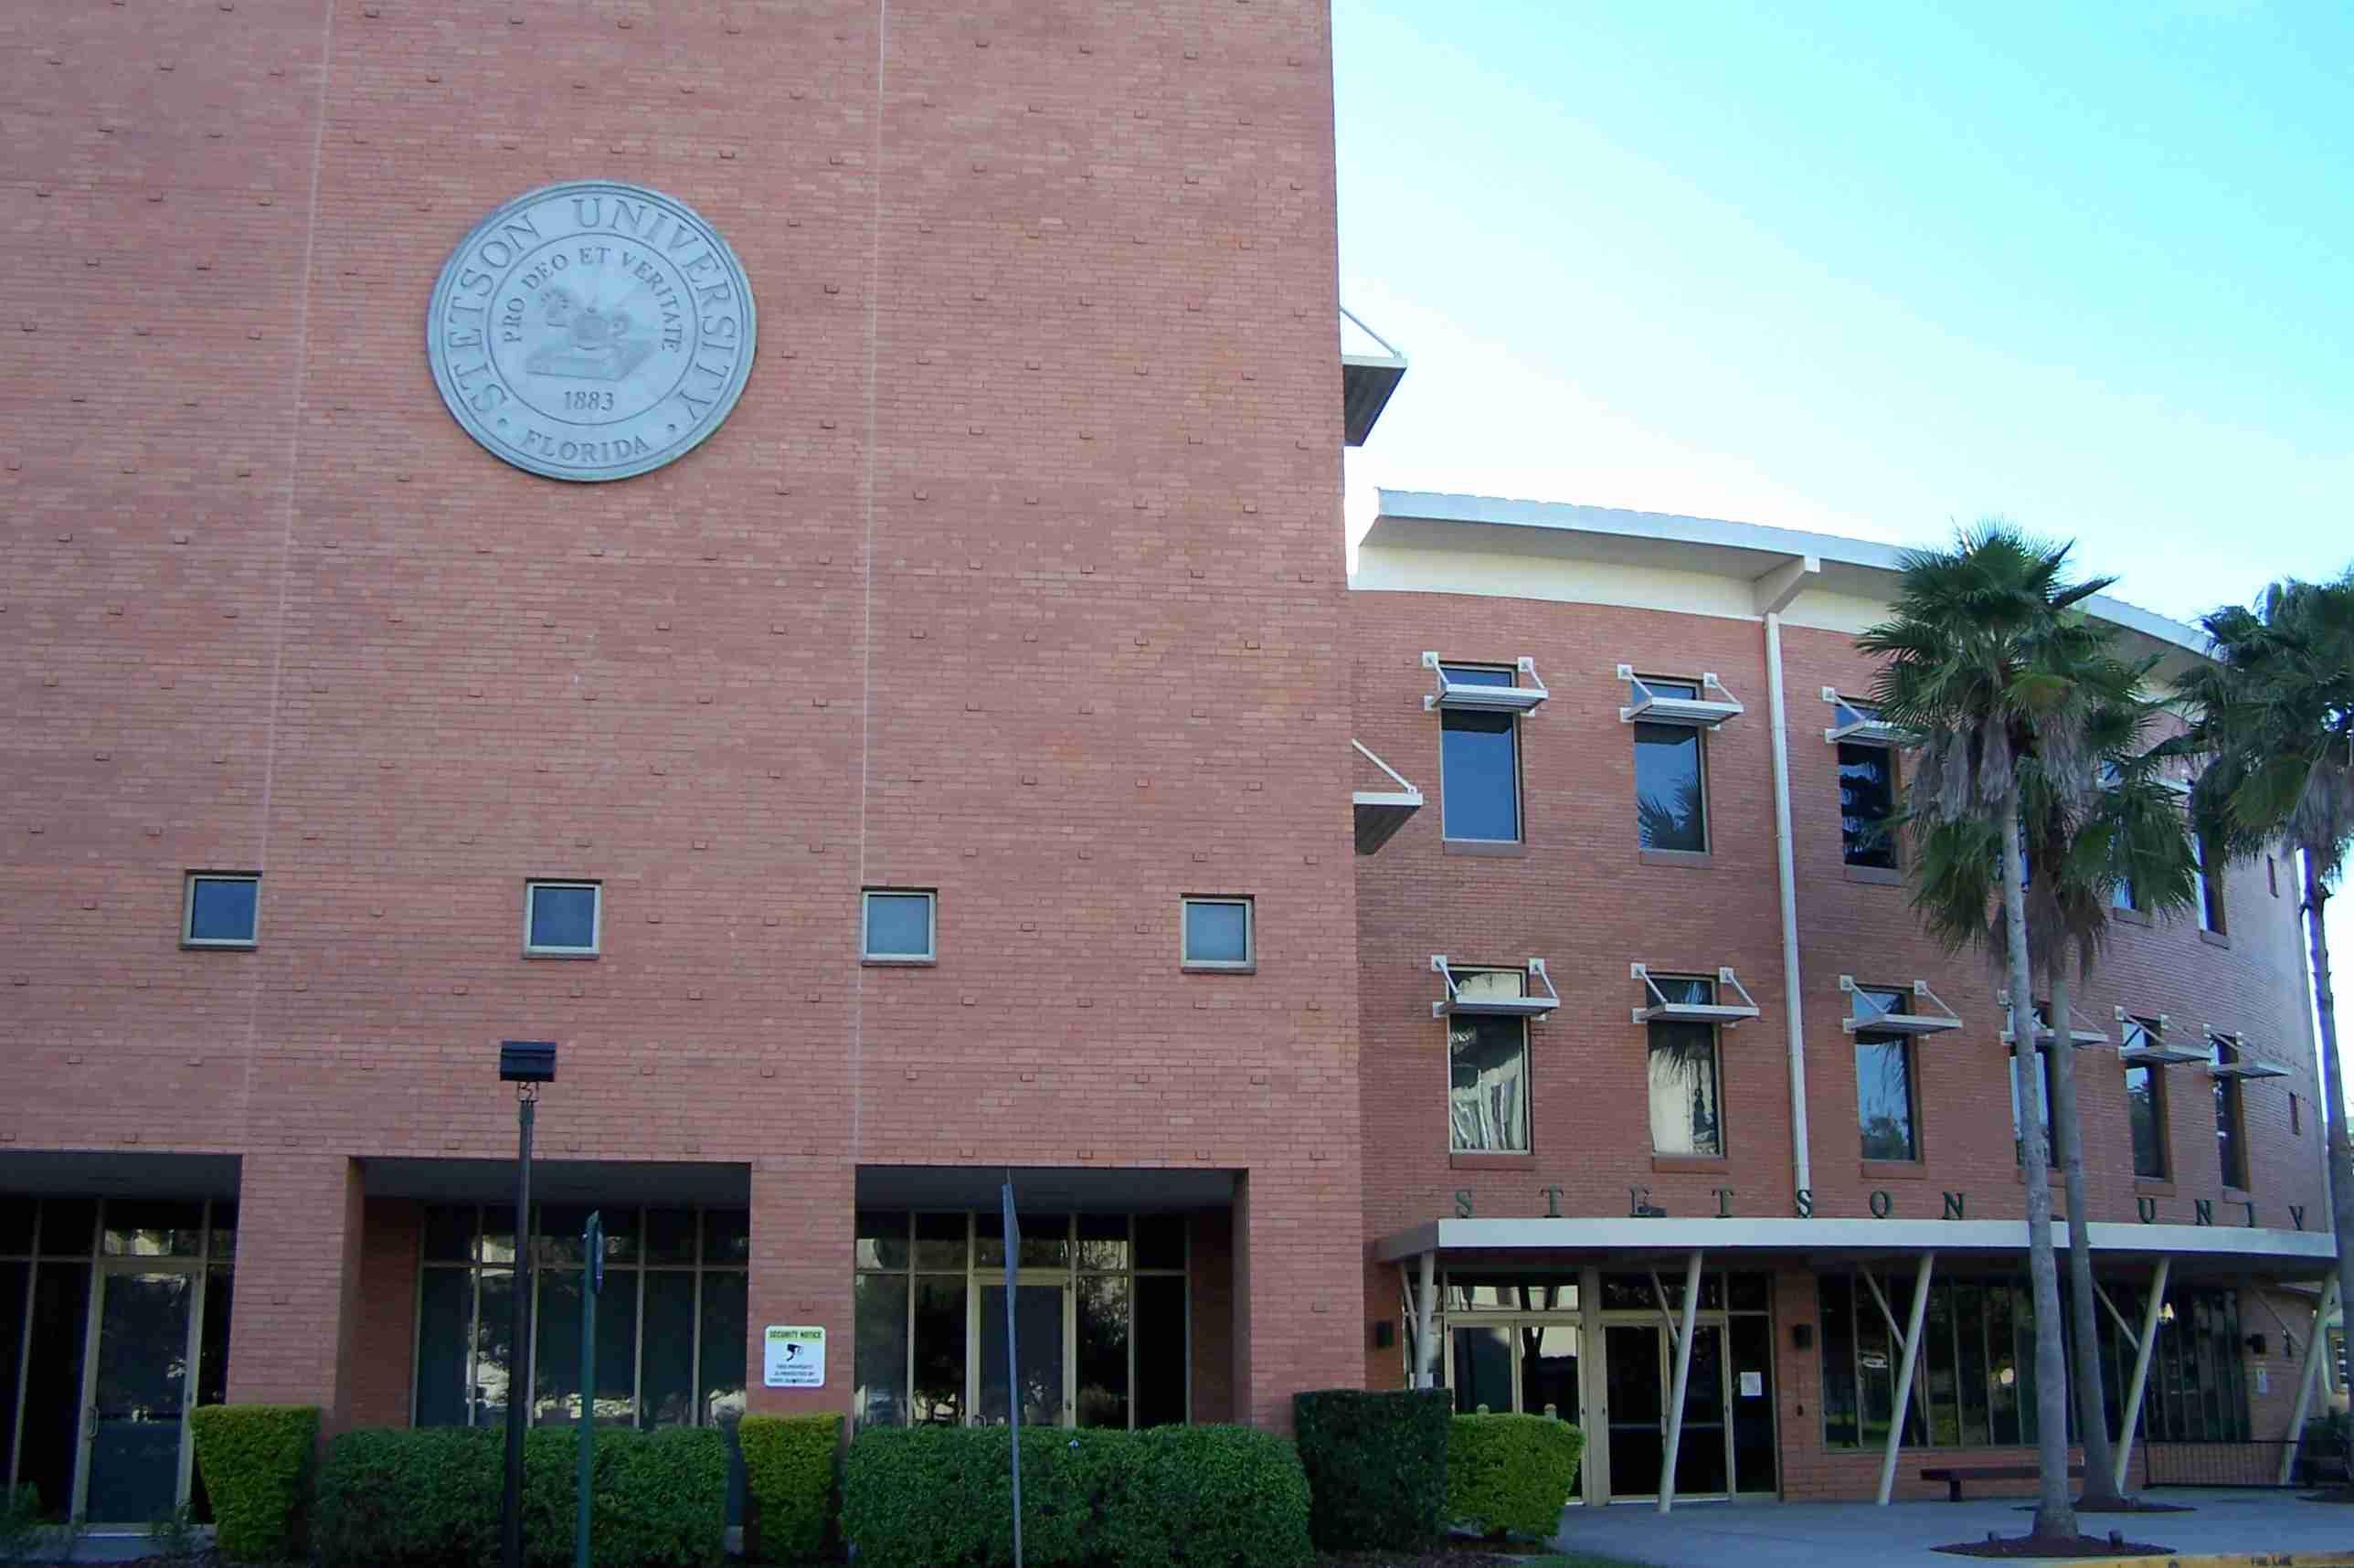 Fachada de ladrillo con emblema, edificio de ladrillo curvo adjunto